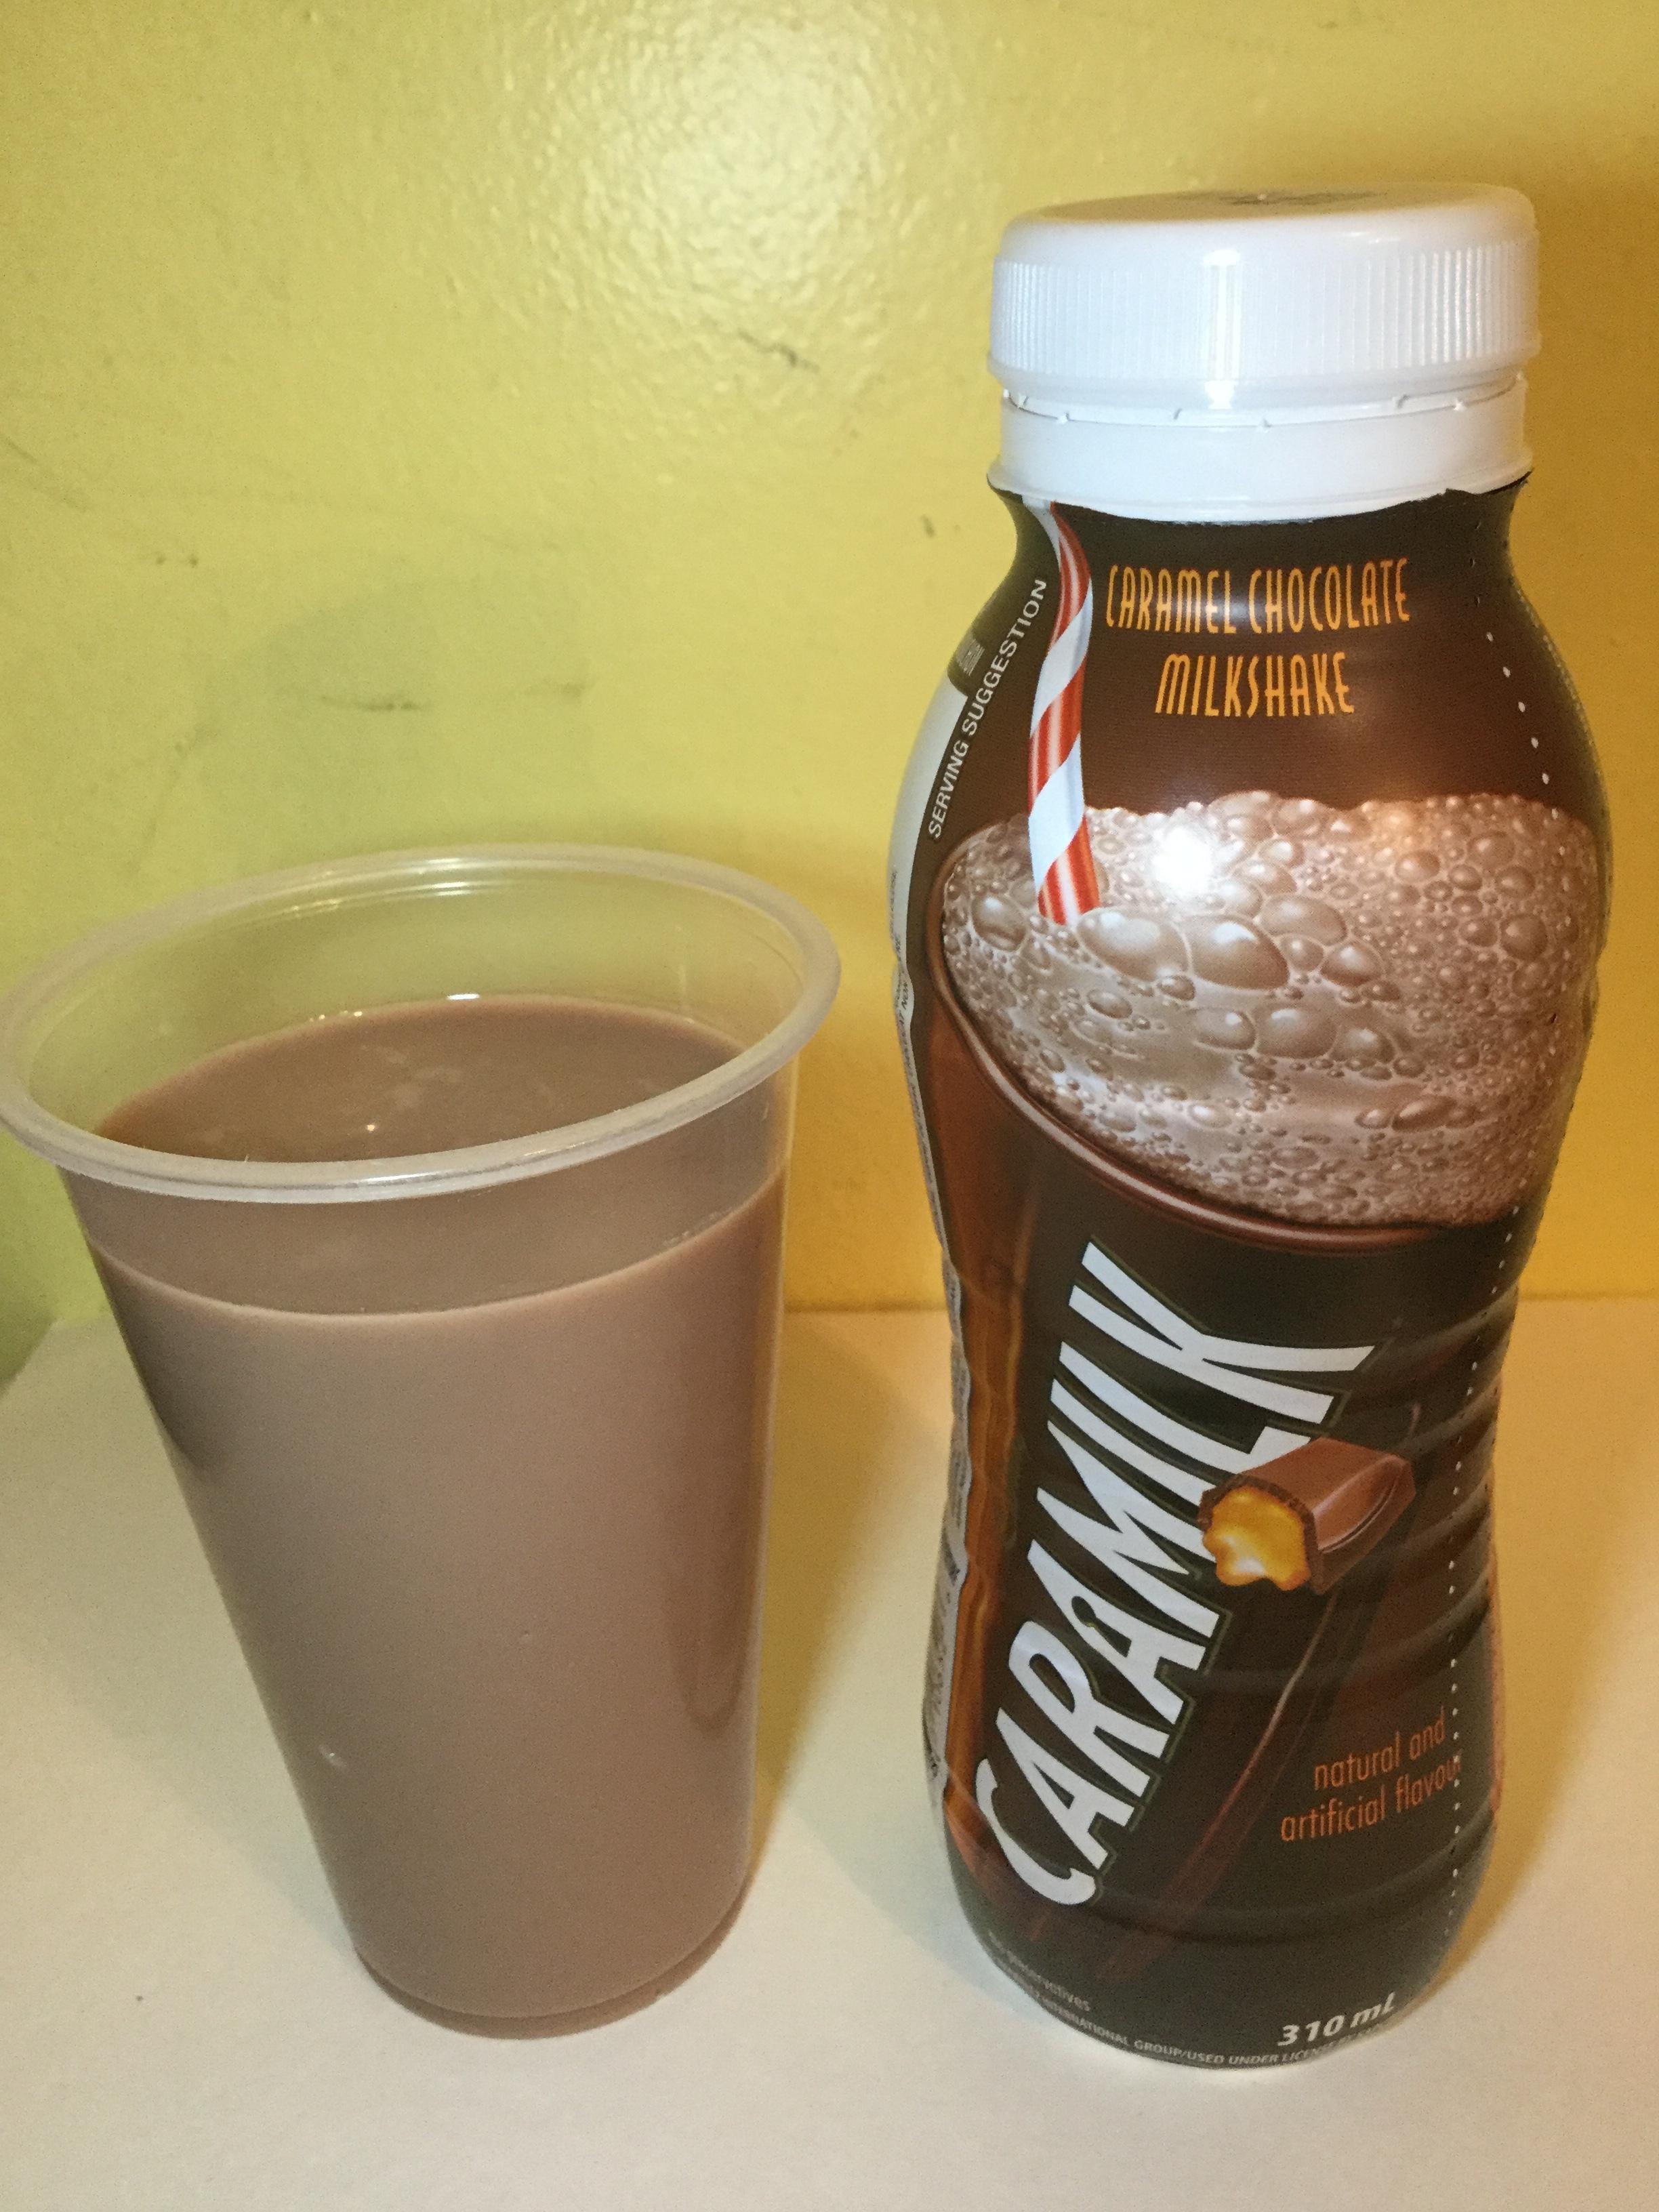 Cadbury Caramilk Caramel Chocolate Milkshake Cup